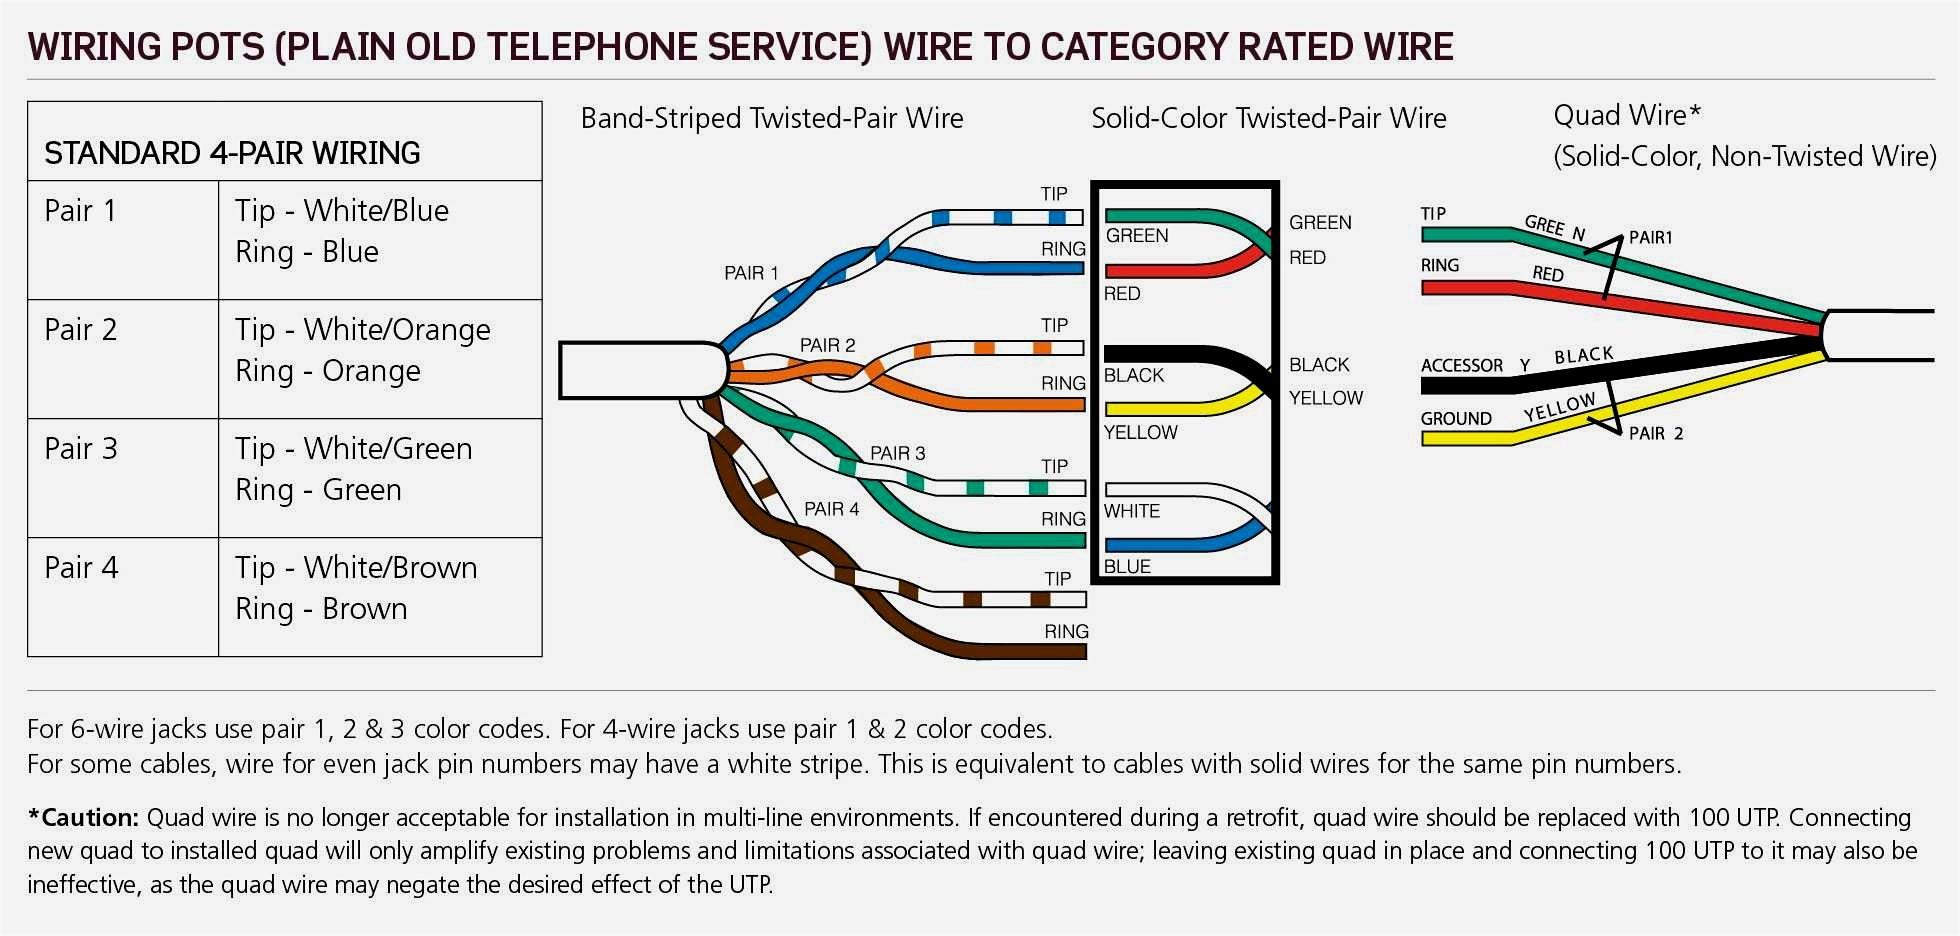 rj11 wall socket wiring diagram australia rj11 wiring diagram using cat5e wiring diagram  rj11 wiring diagram using cat5e